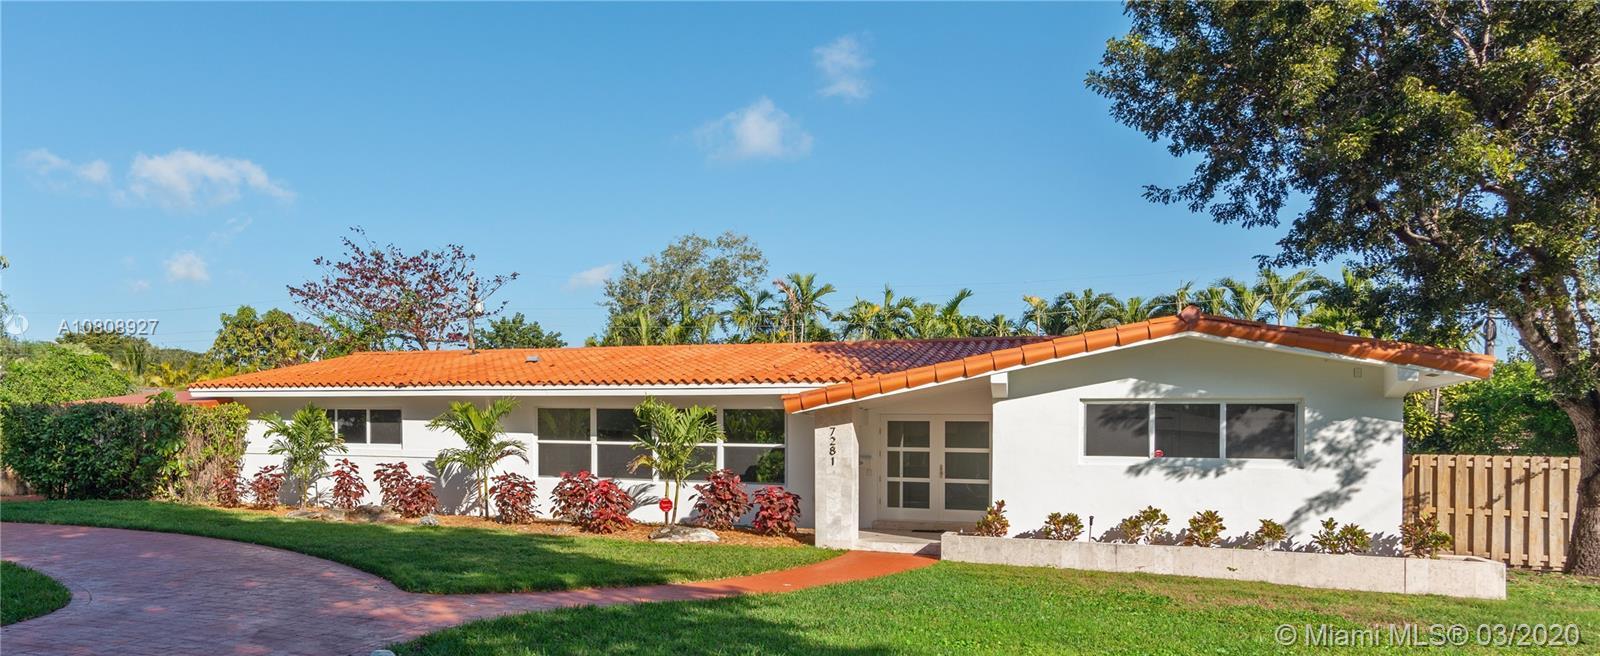 7281 SW 135 Terrace  For Sale A10808927, FL